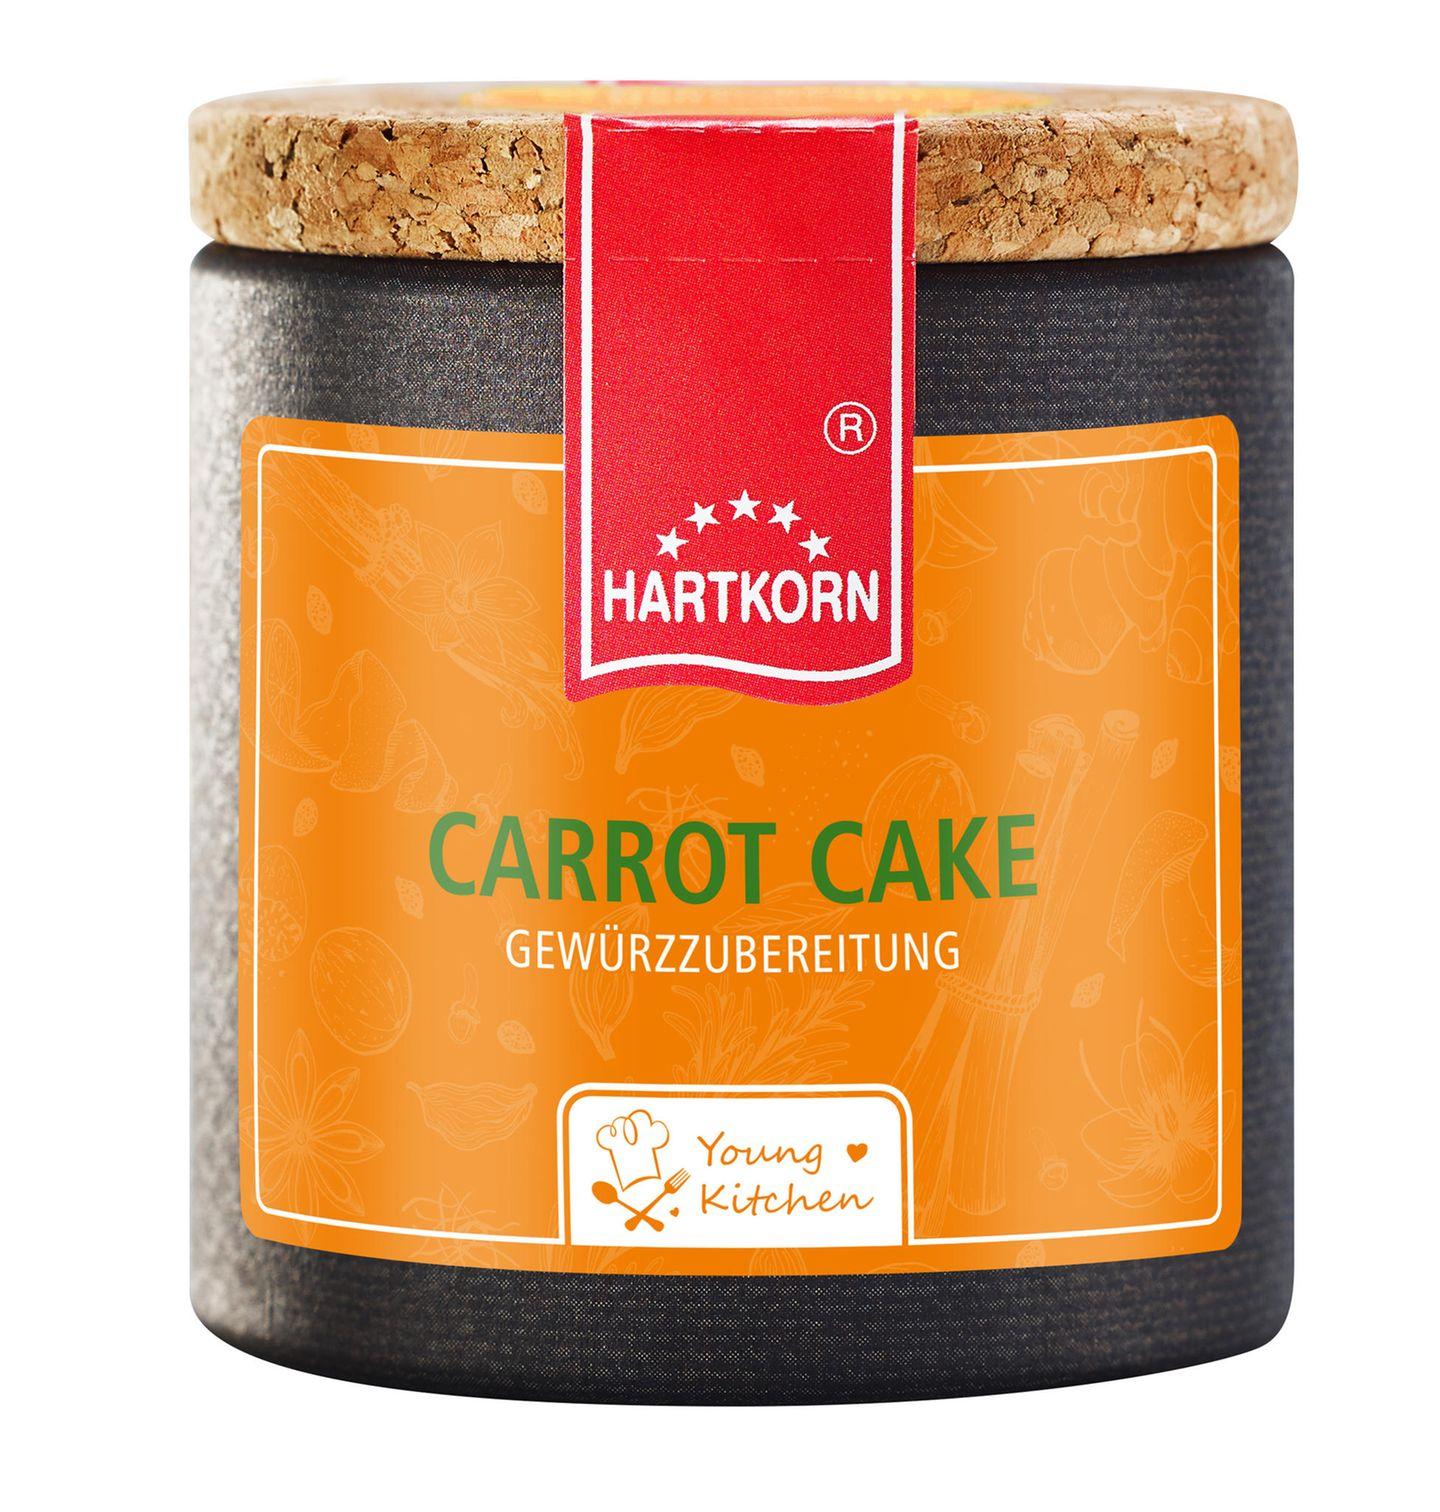 Food News: Hartkorn Carrot Cake Gewürz